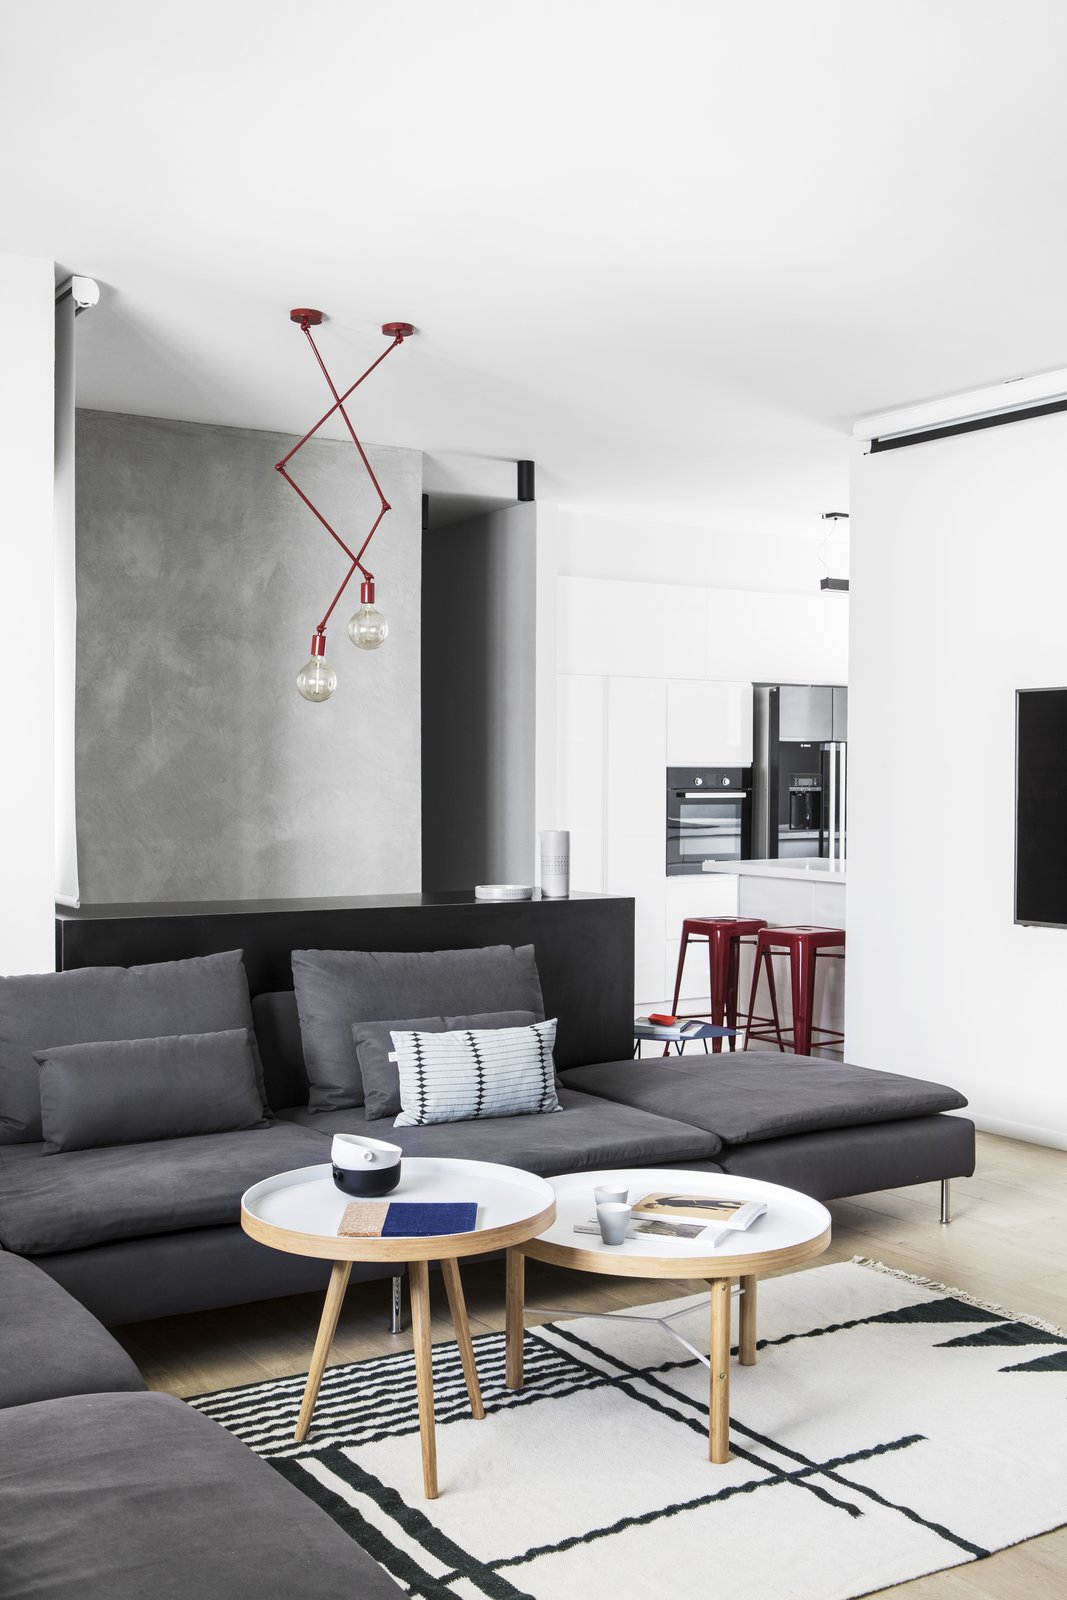 Living Room, Bench, Chair, Floor Lighting, Light Hardwood Floor, Sofa, and Ceiling Lighting Living Room  A|A Duplex by YAEL PERRY | INTERIOR DESIGNER